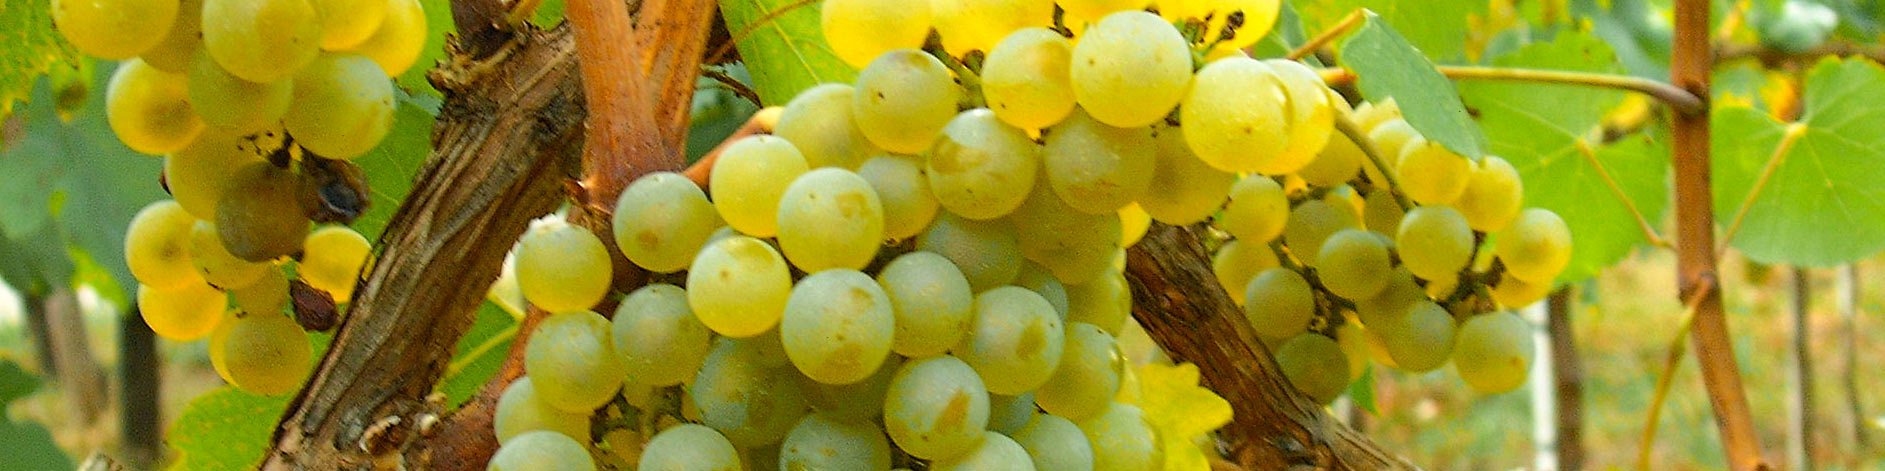 Garda Chardonnay d.o.c. La  Meridiana azienda  agricola